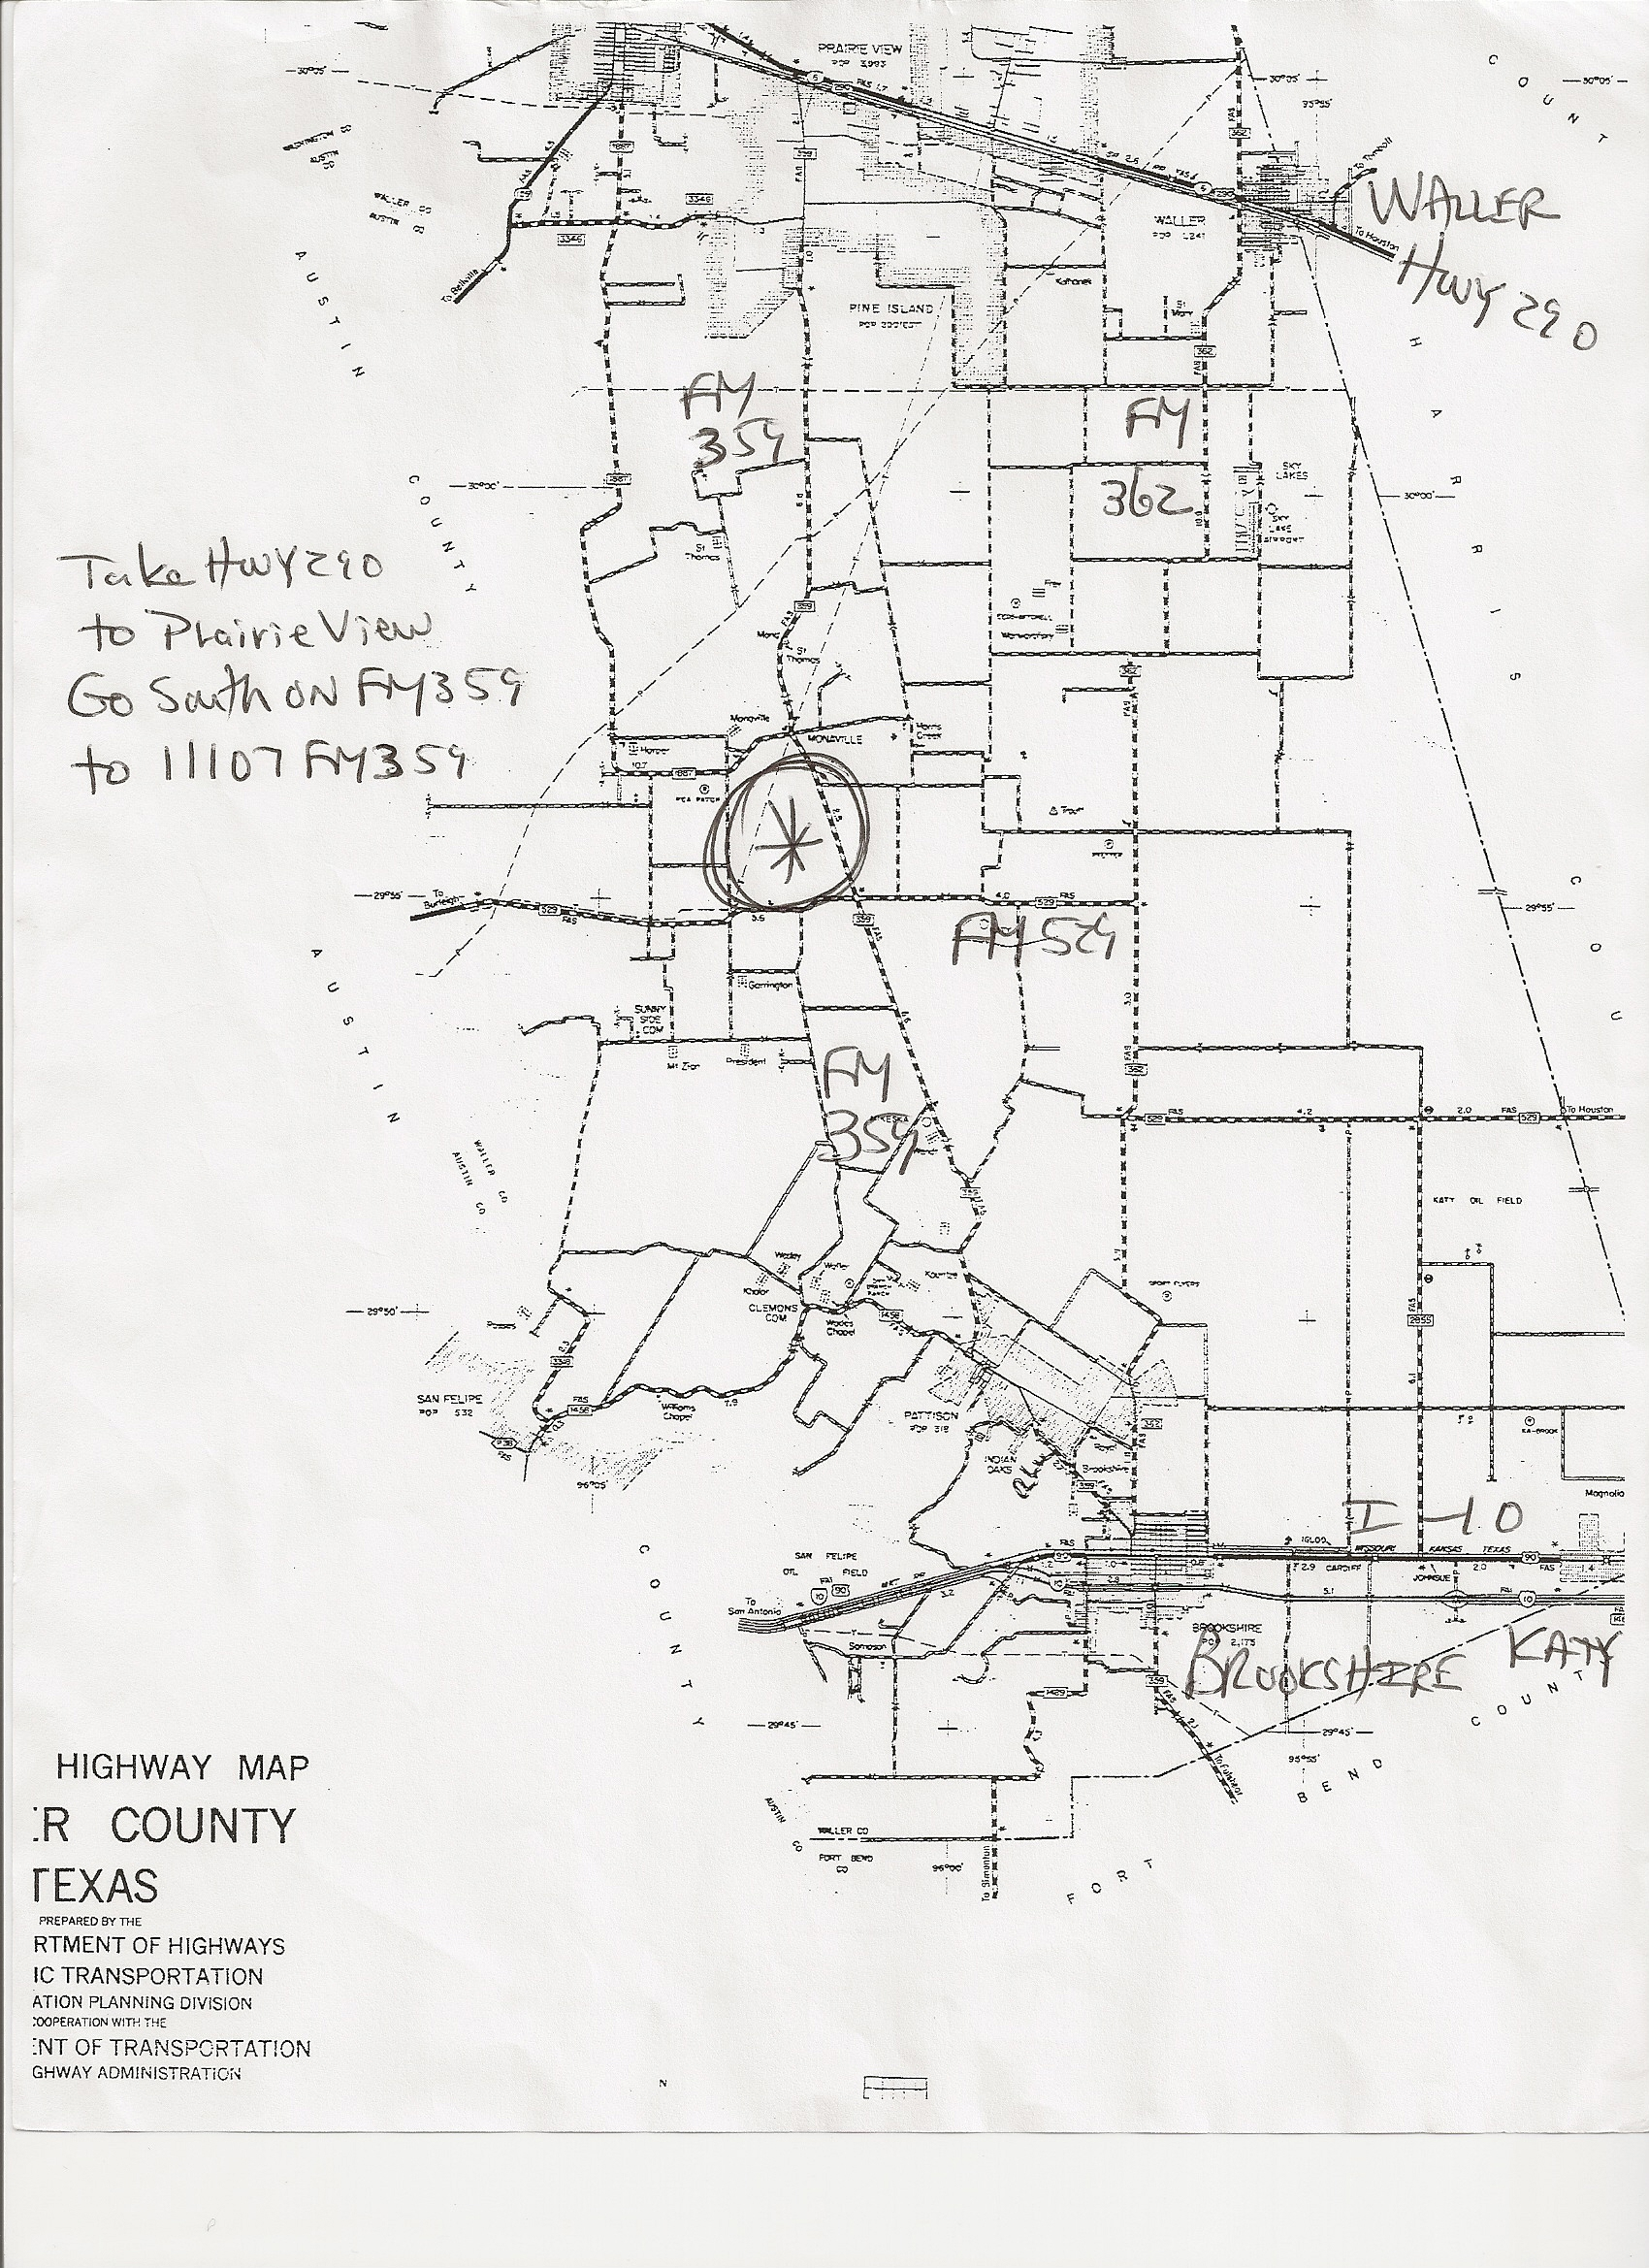 249 Acres In Waller County Texas